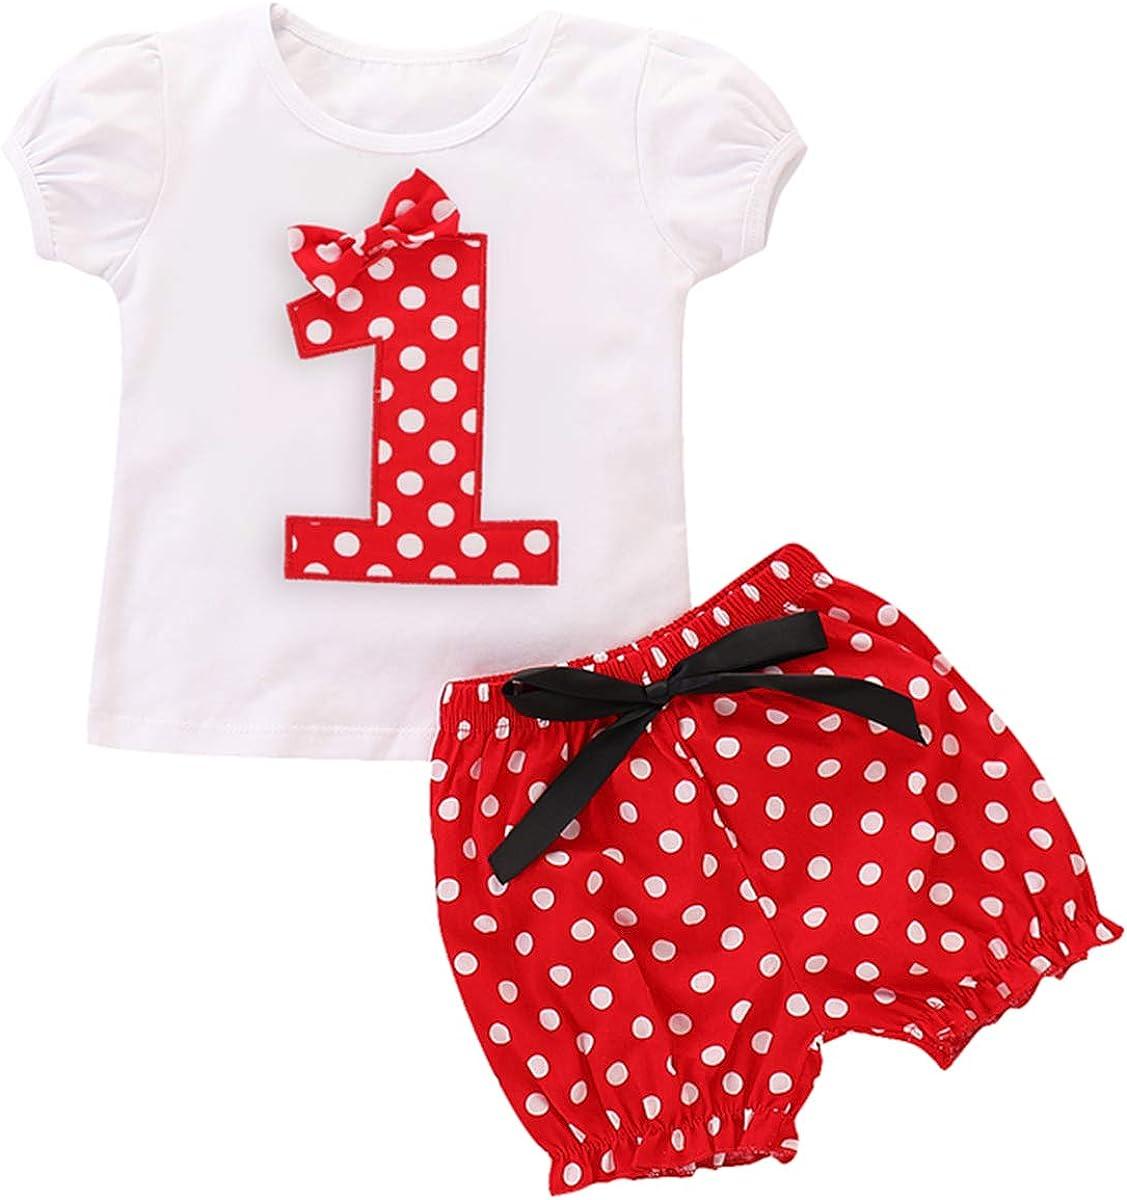 Birthday Girl T-Shirt Red//White Polka Dot Black Ruffle Tutu /& Headband 3 PCs Outfit Set